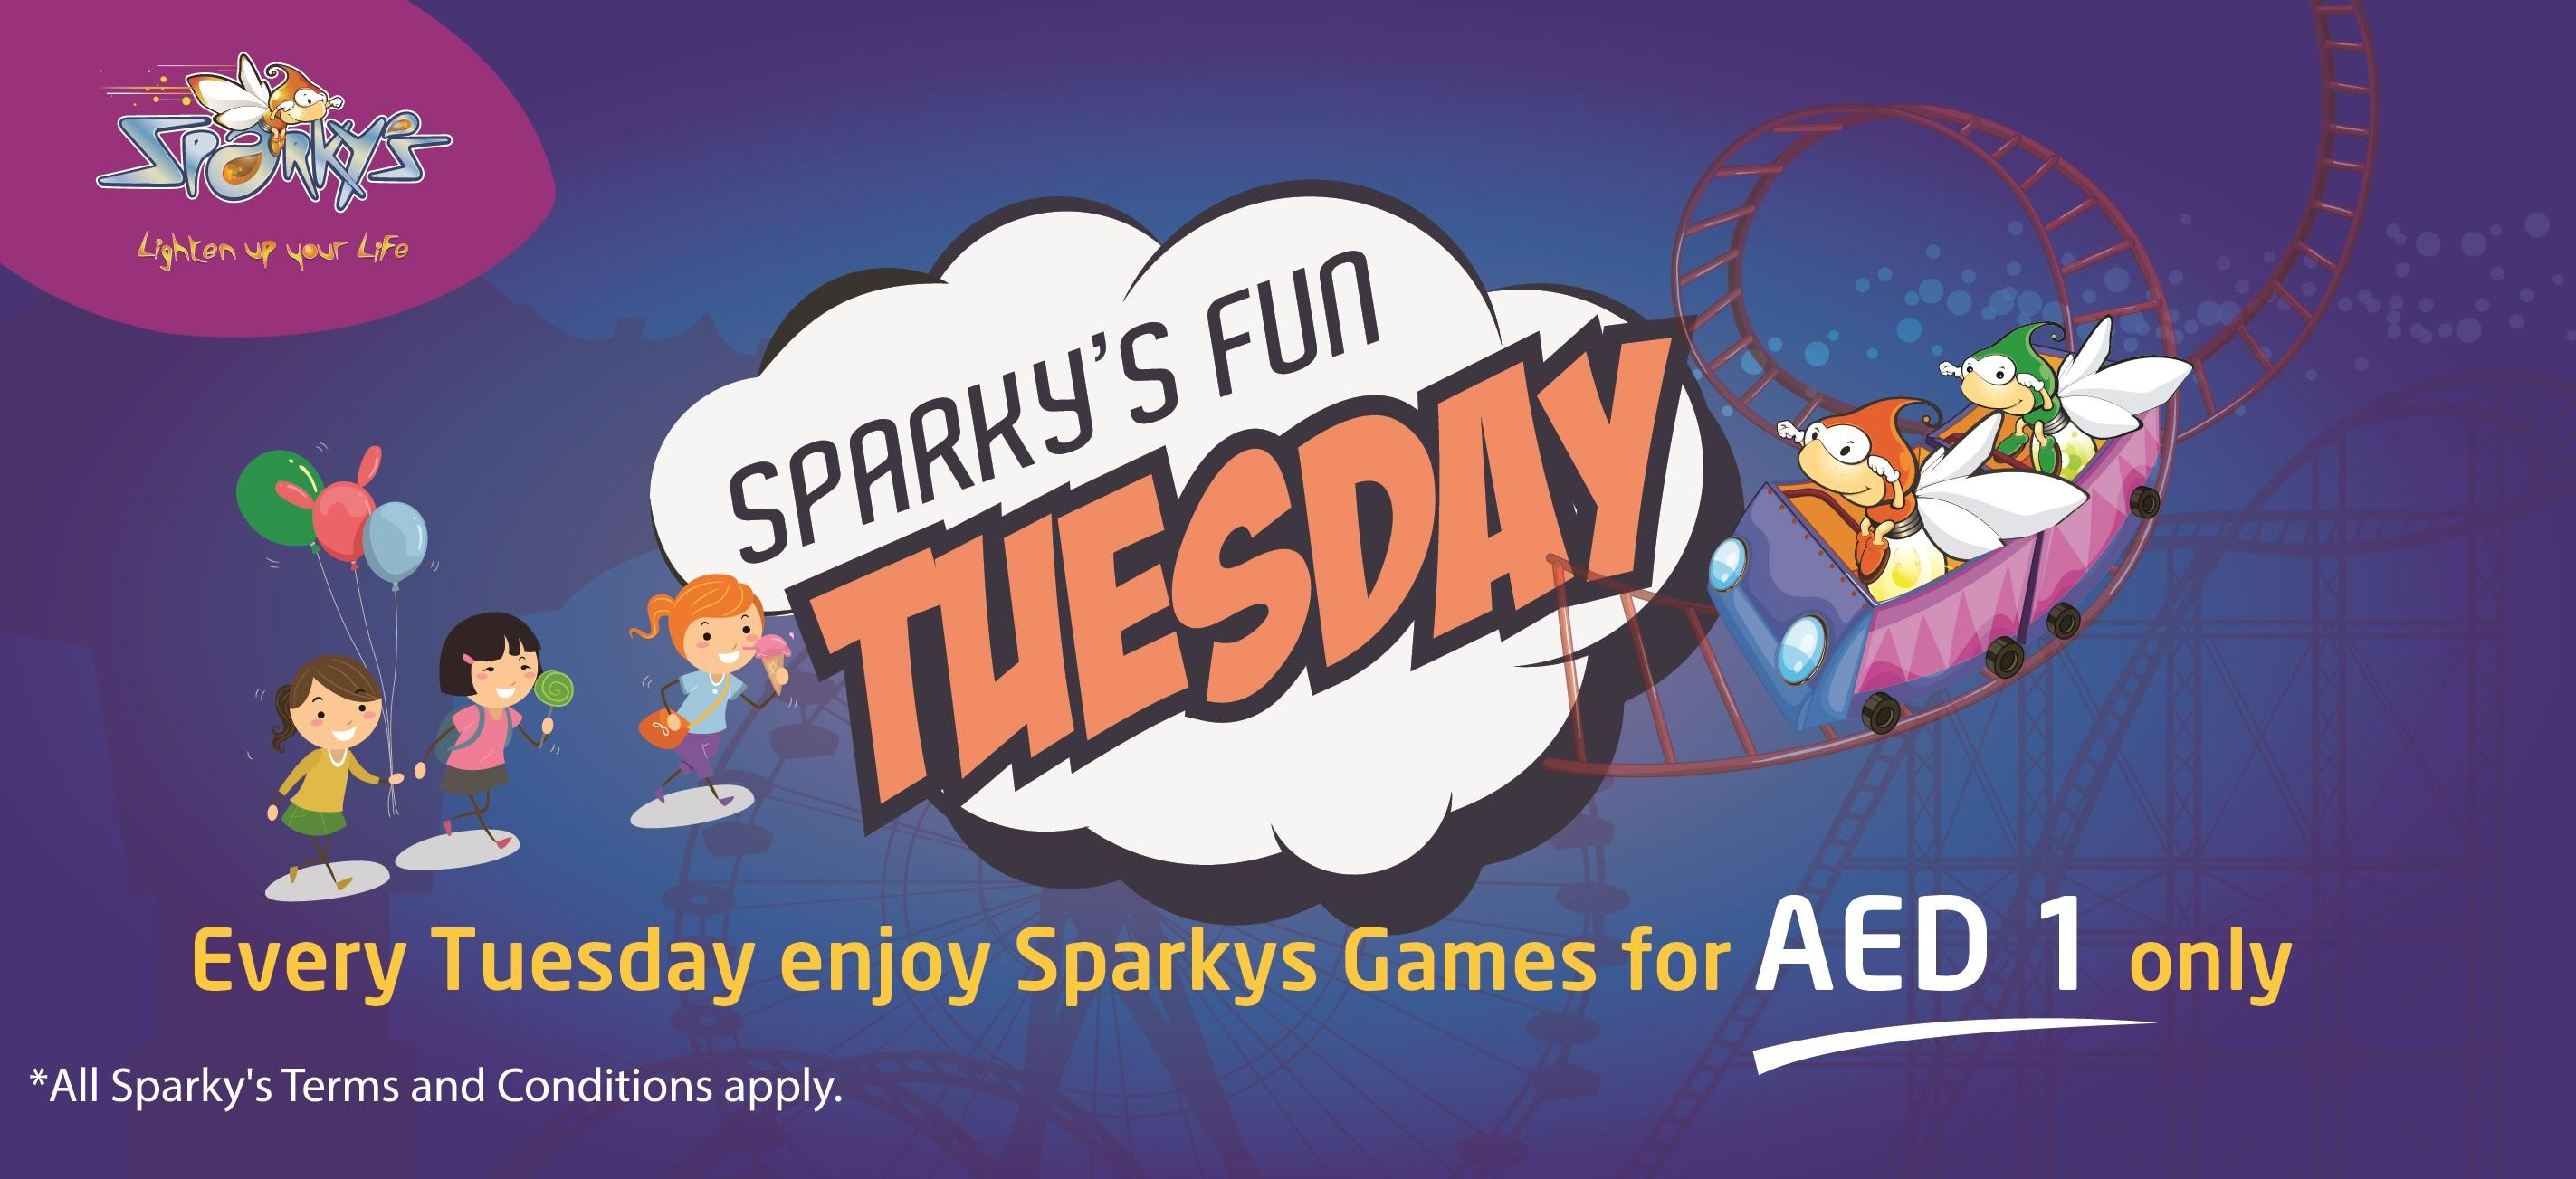 Sparky's Fun Tuesday